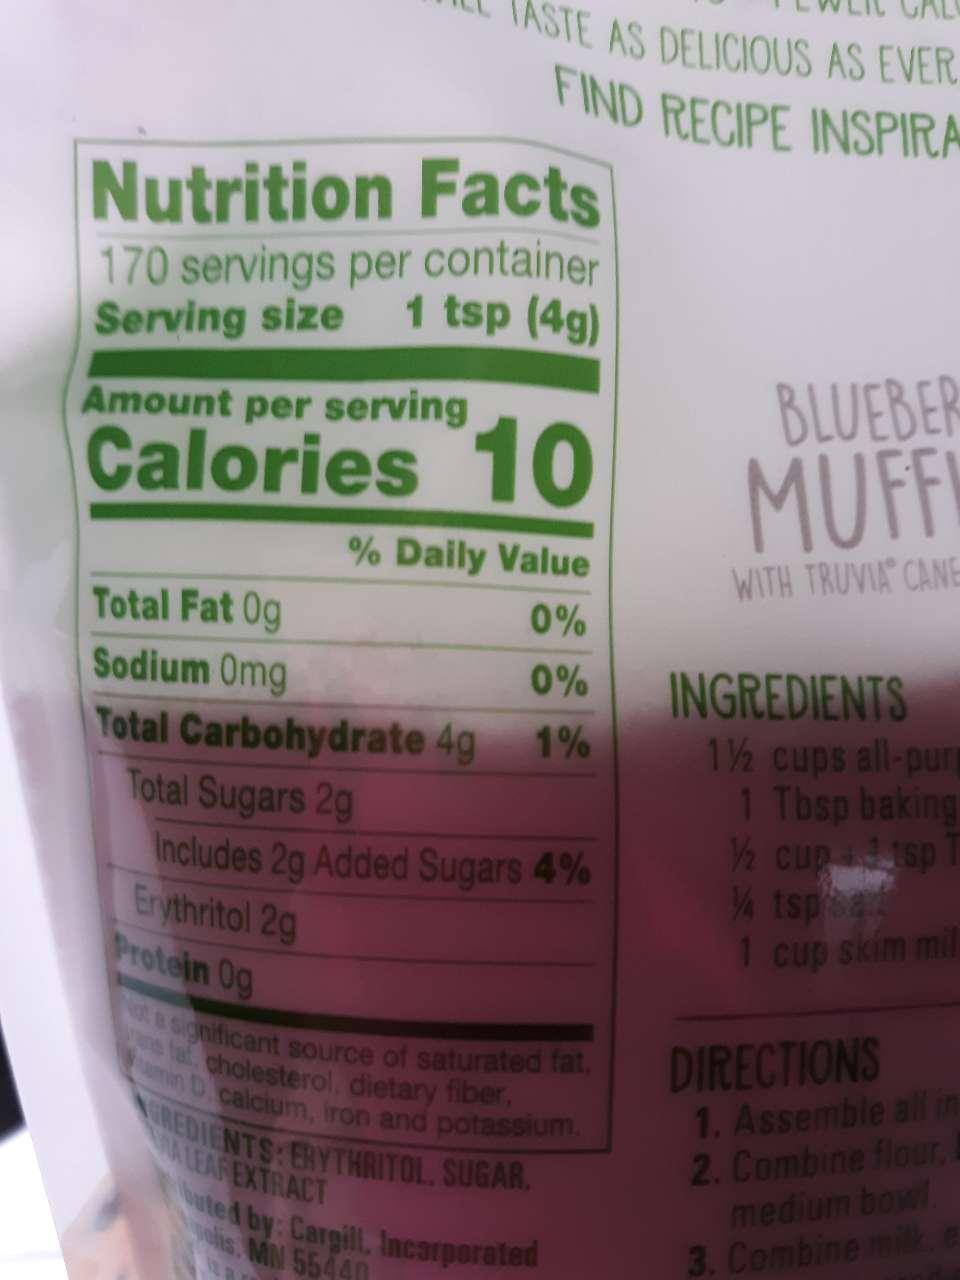 Truvia Baking Blend: Calories